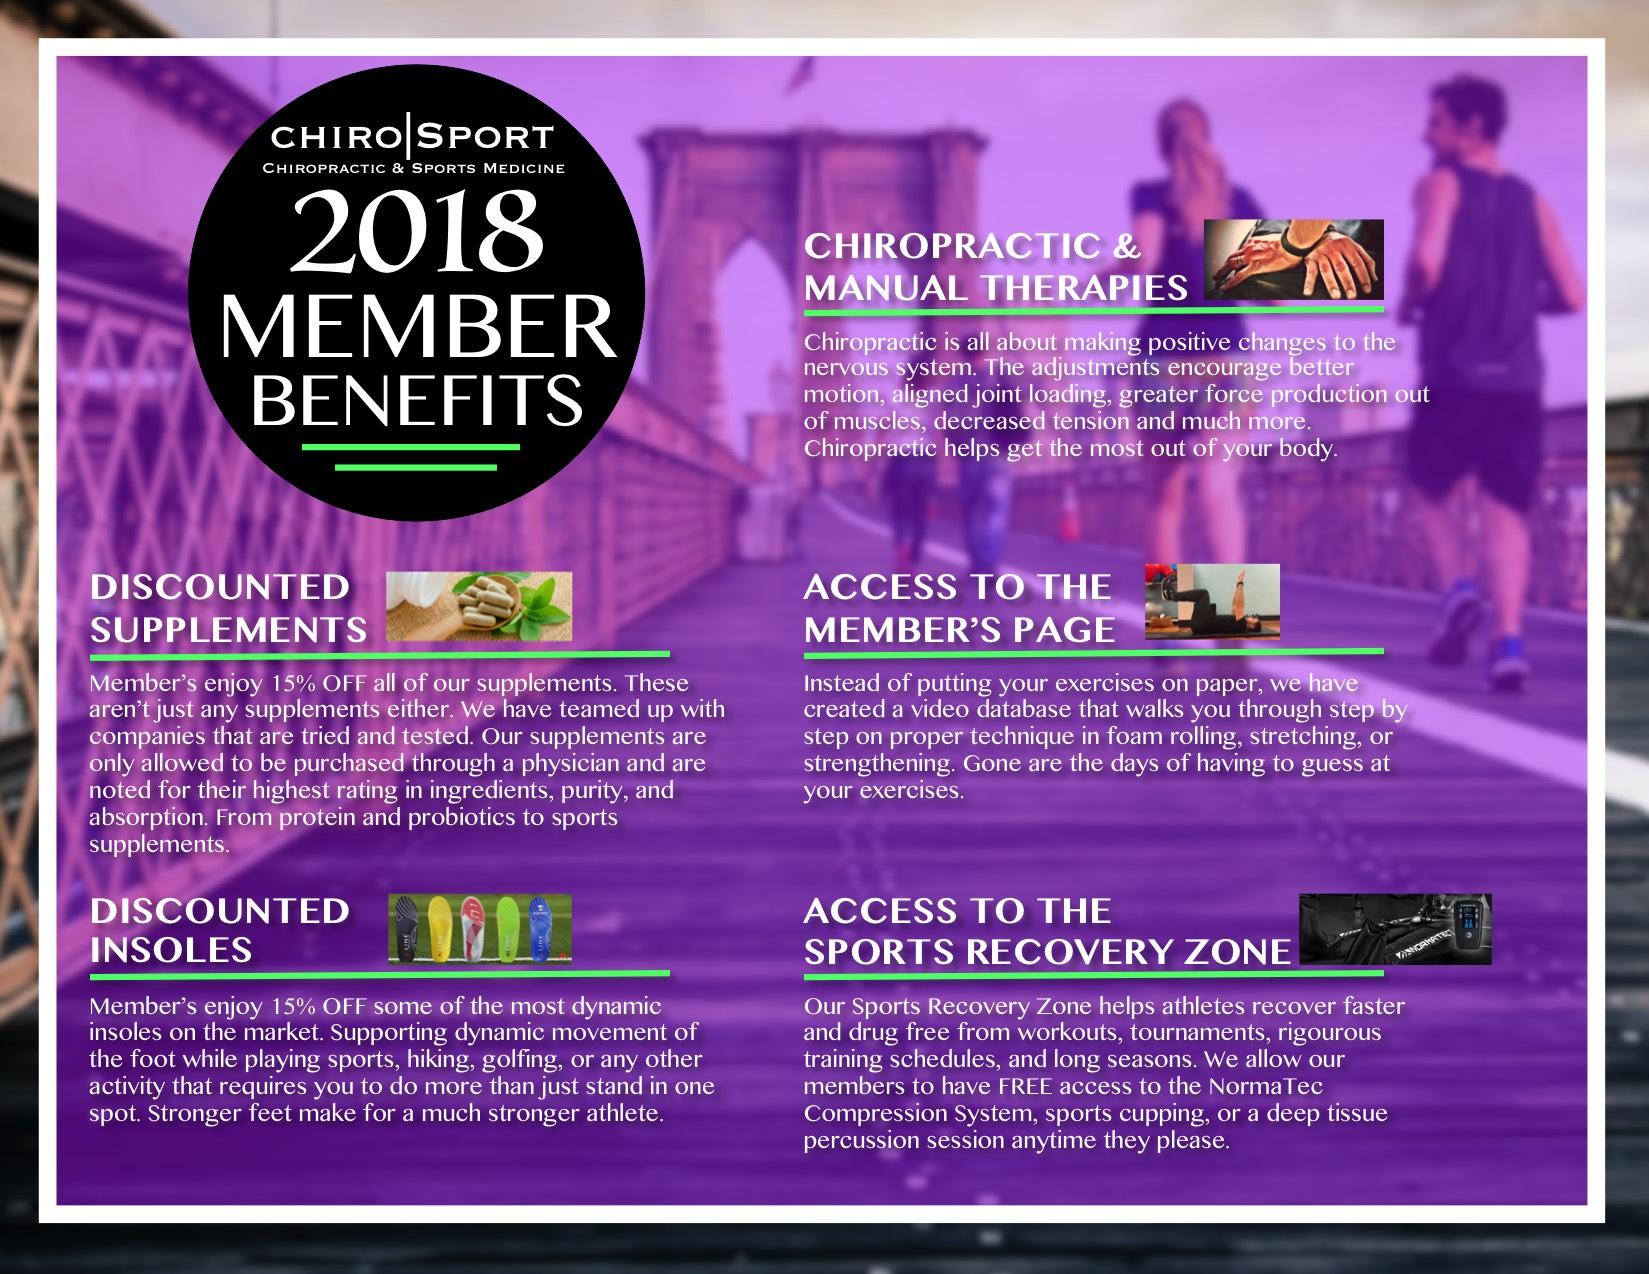 member-benefits-chirosportne.jpeg